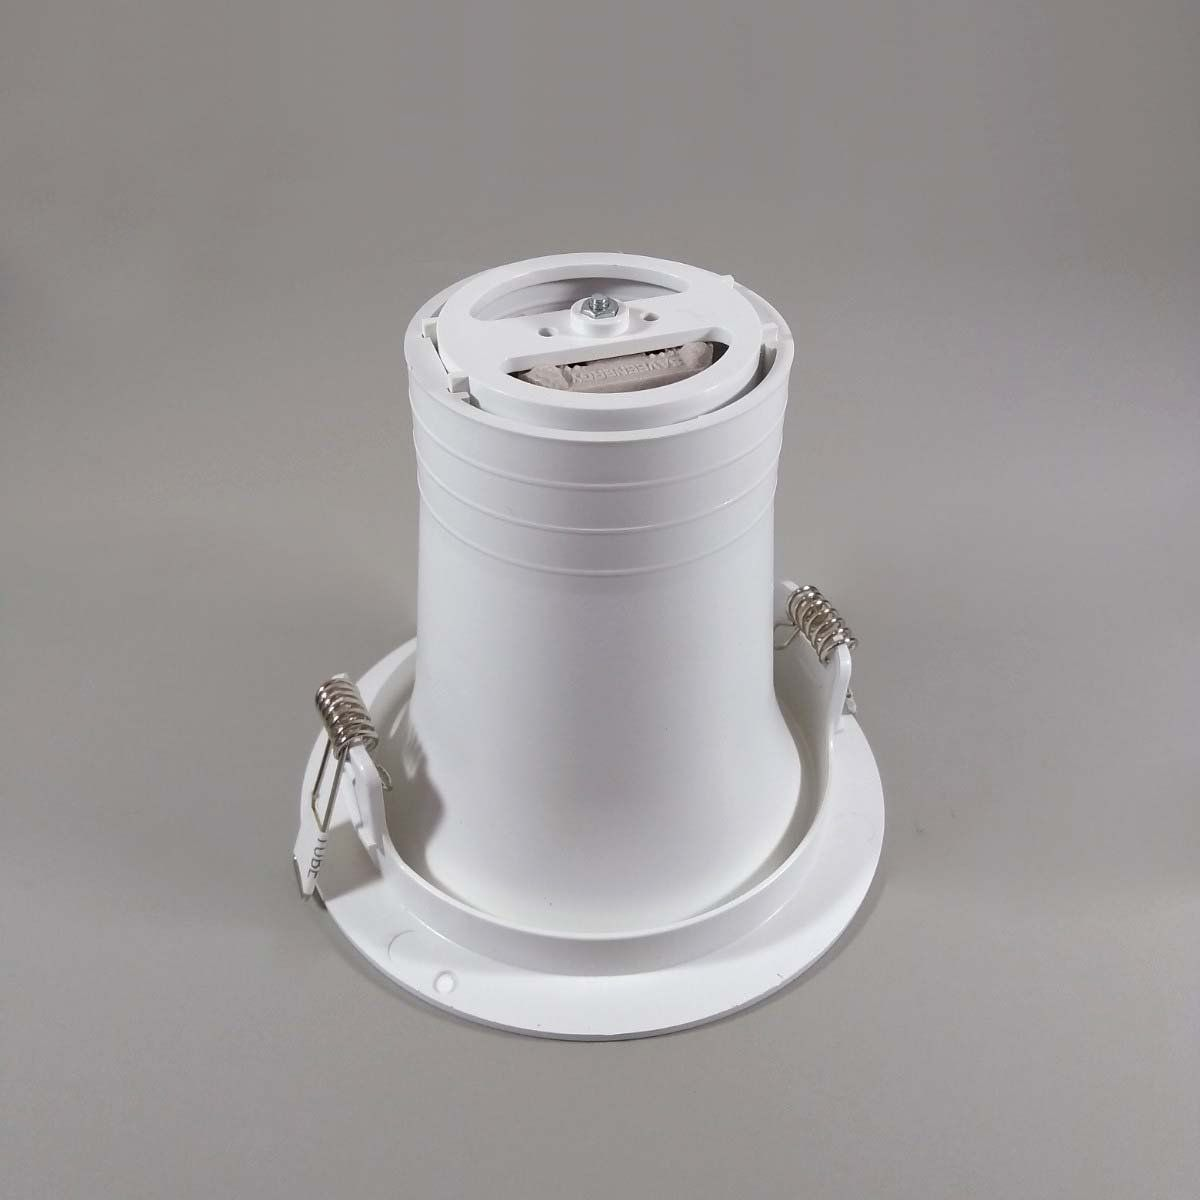 Spot Embutido Redondo Bulbo Branco Save energy